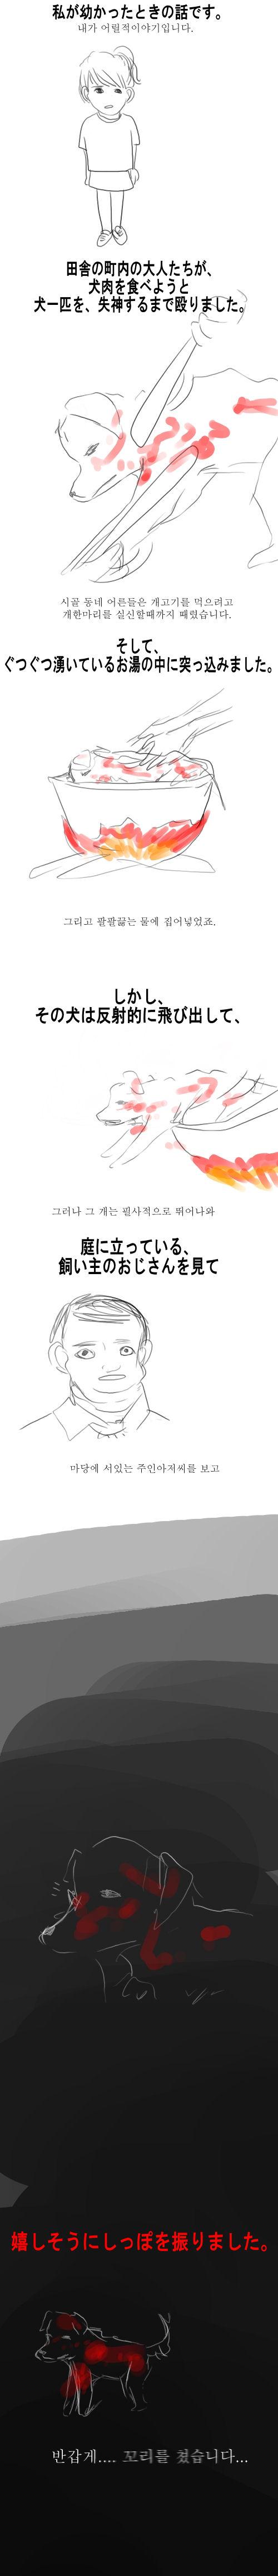 KANKOKUDOGMEAT13.jpg